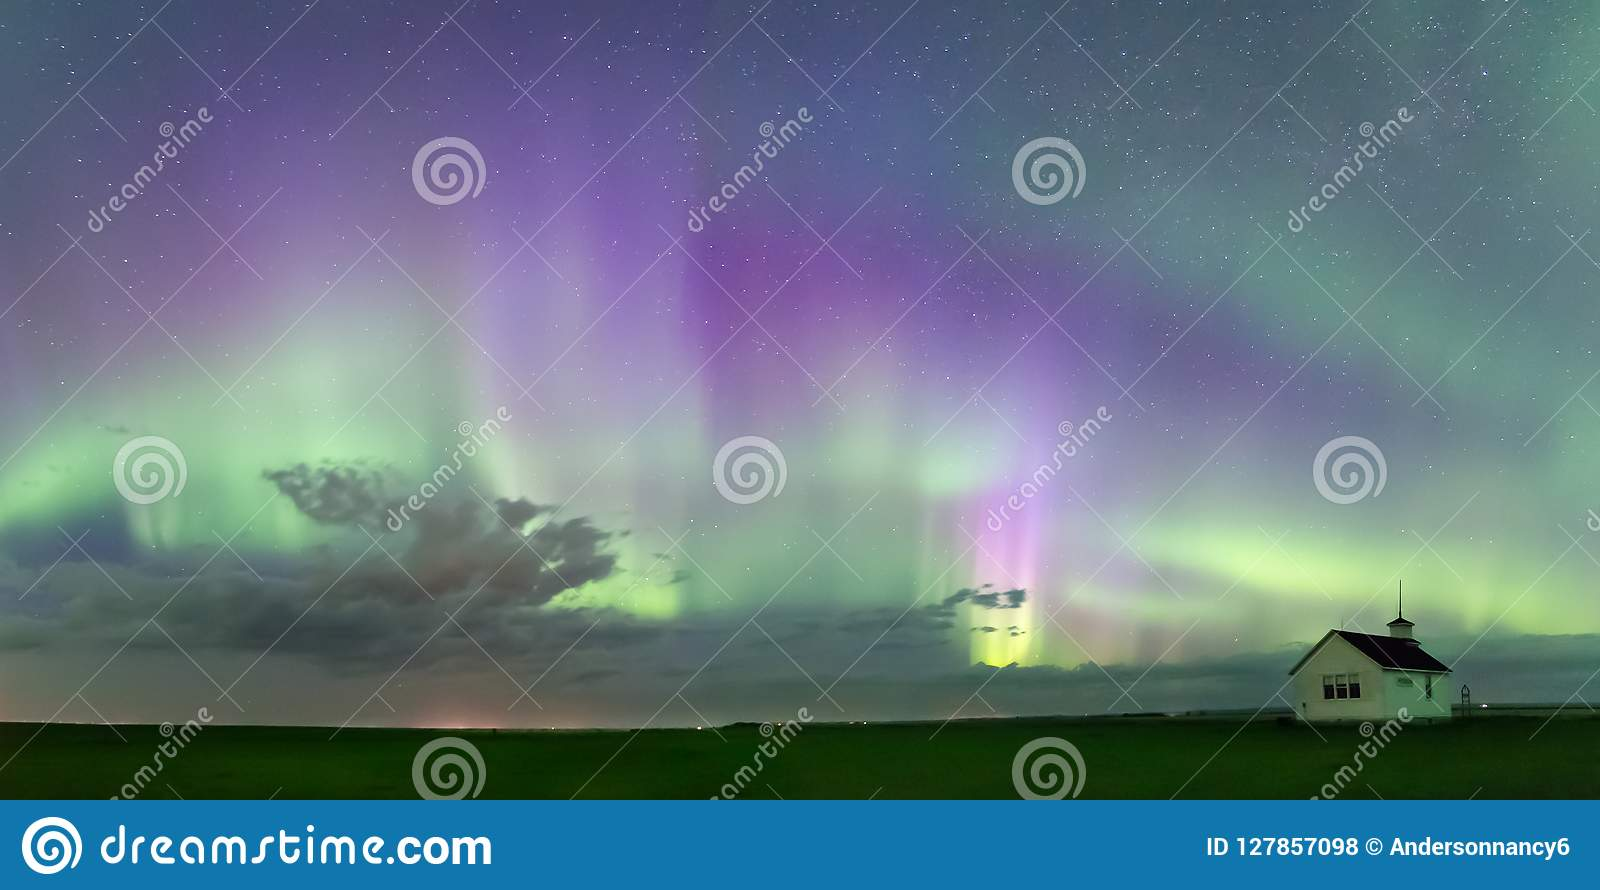 Swirl of Aurora Borealis Northern Lights over the historical North Saskatchewan Landing school